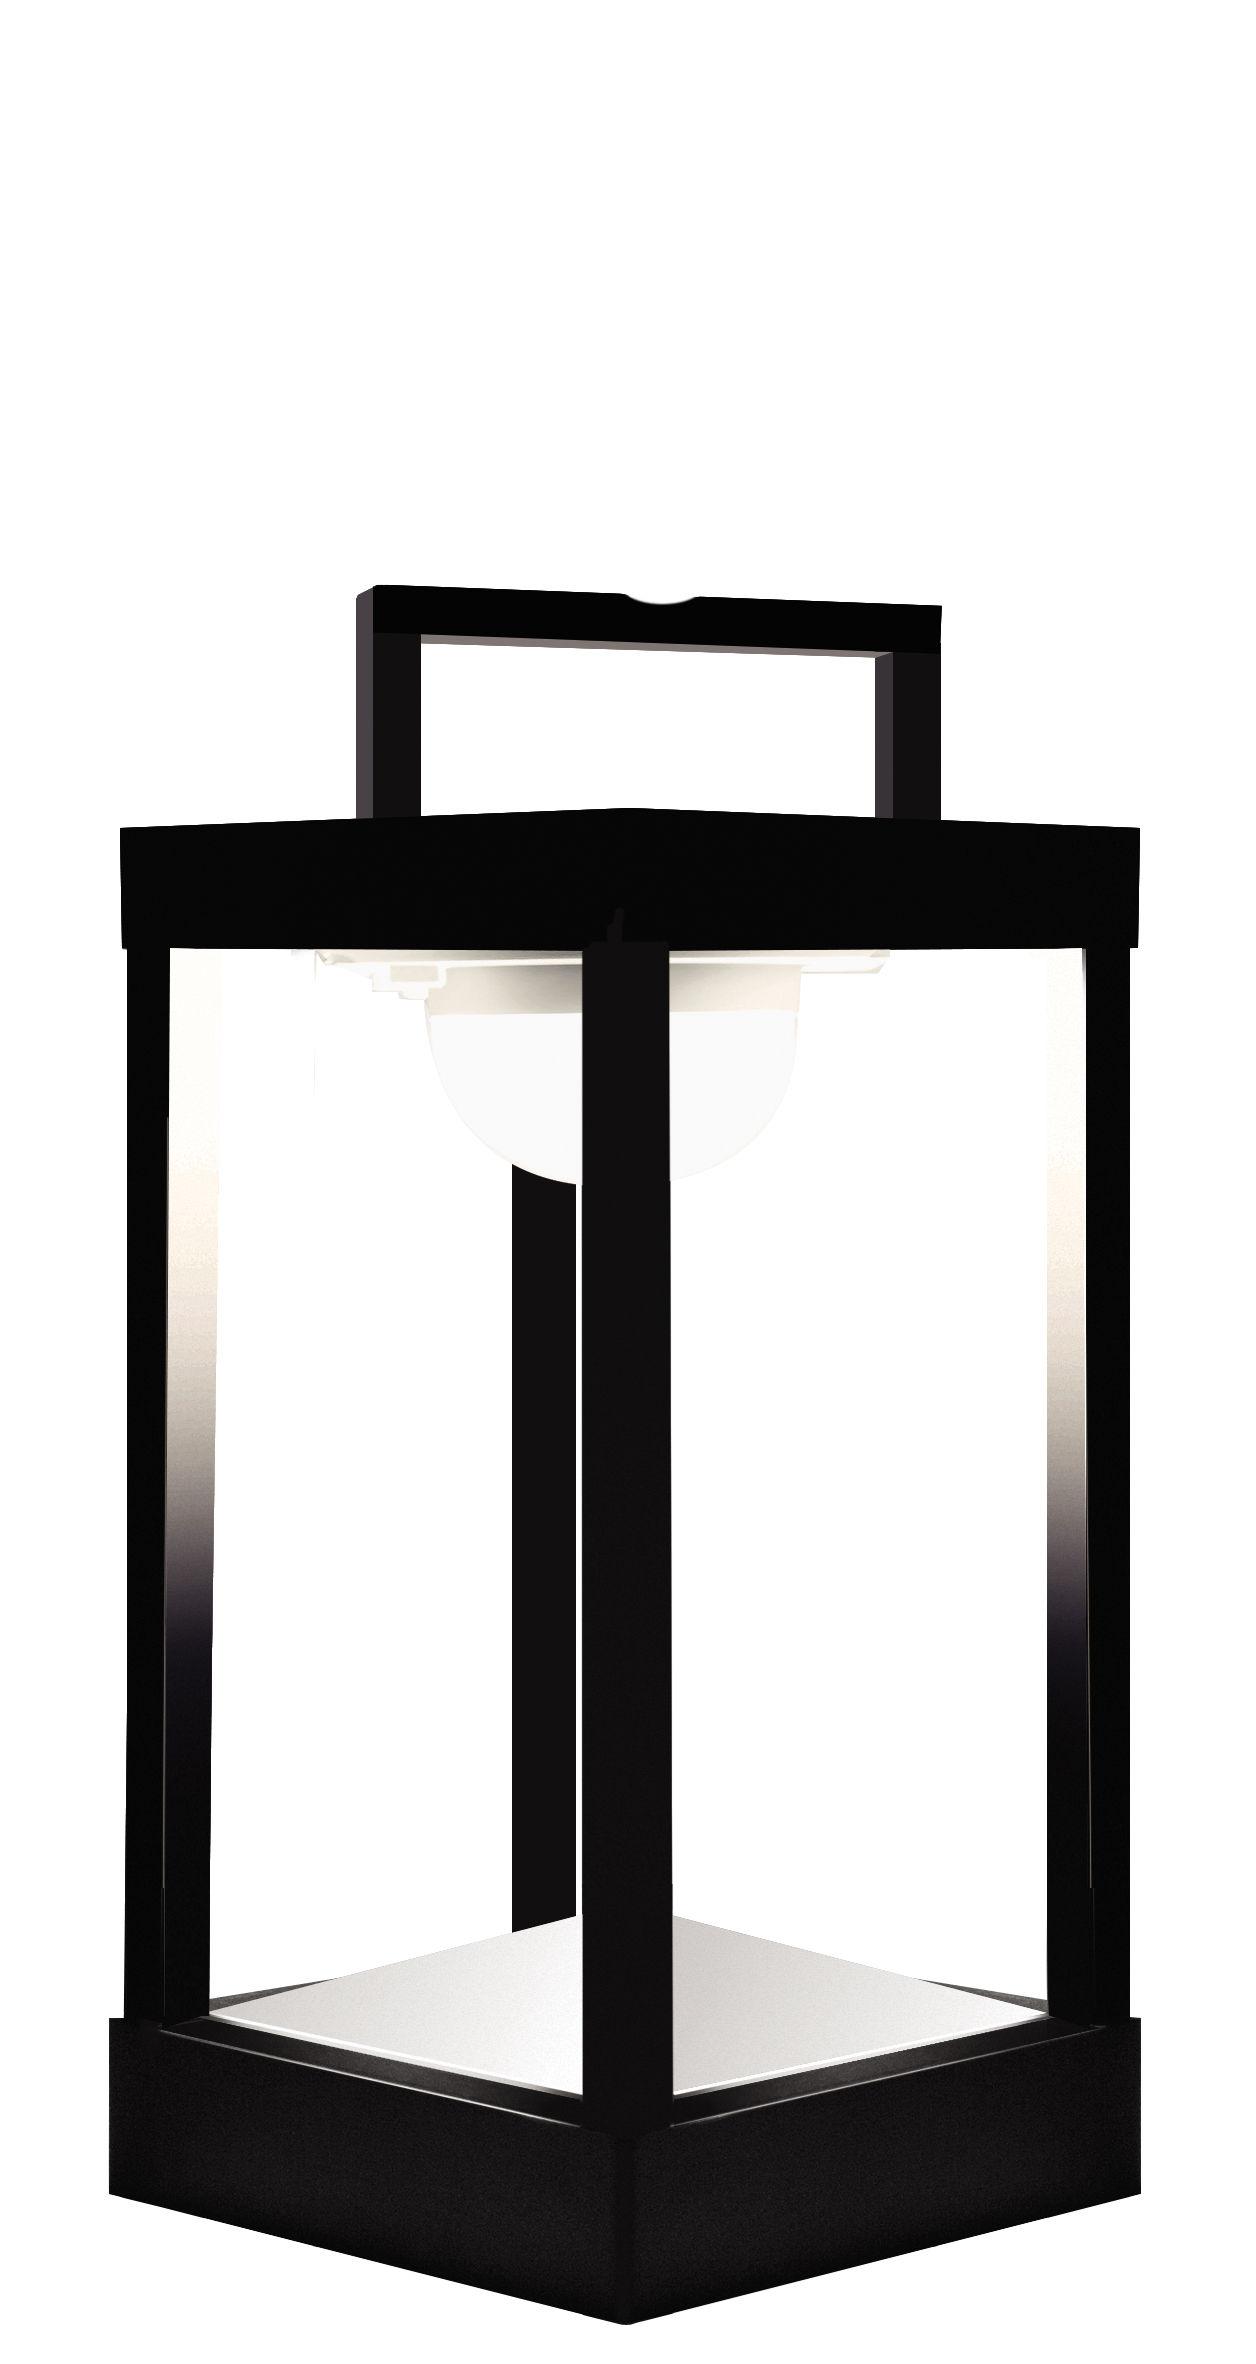 Lighting - Table Lamps - La Lampe Parc S Solar lamp - LED - Wireless - H 30 cm by Maiori - Black - Aluminium, Glass